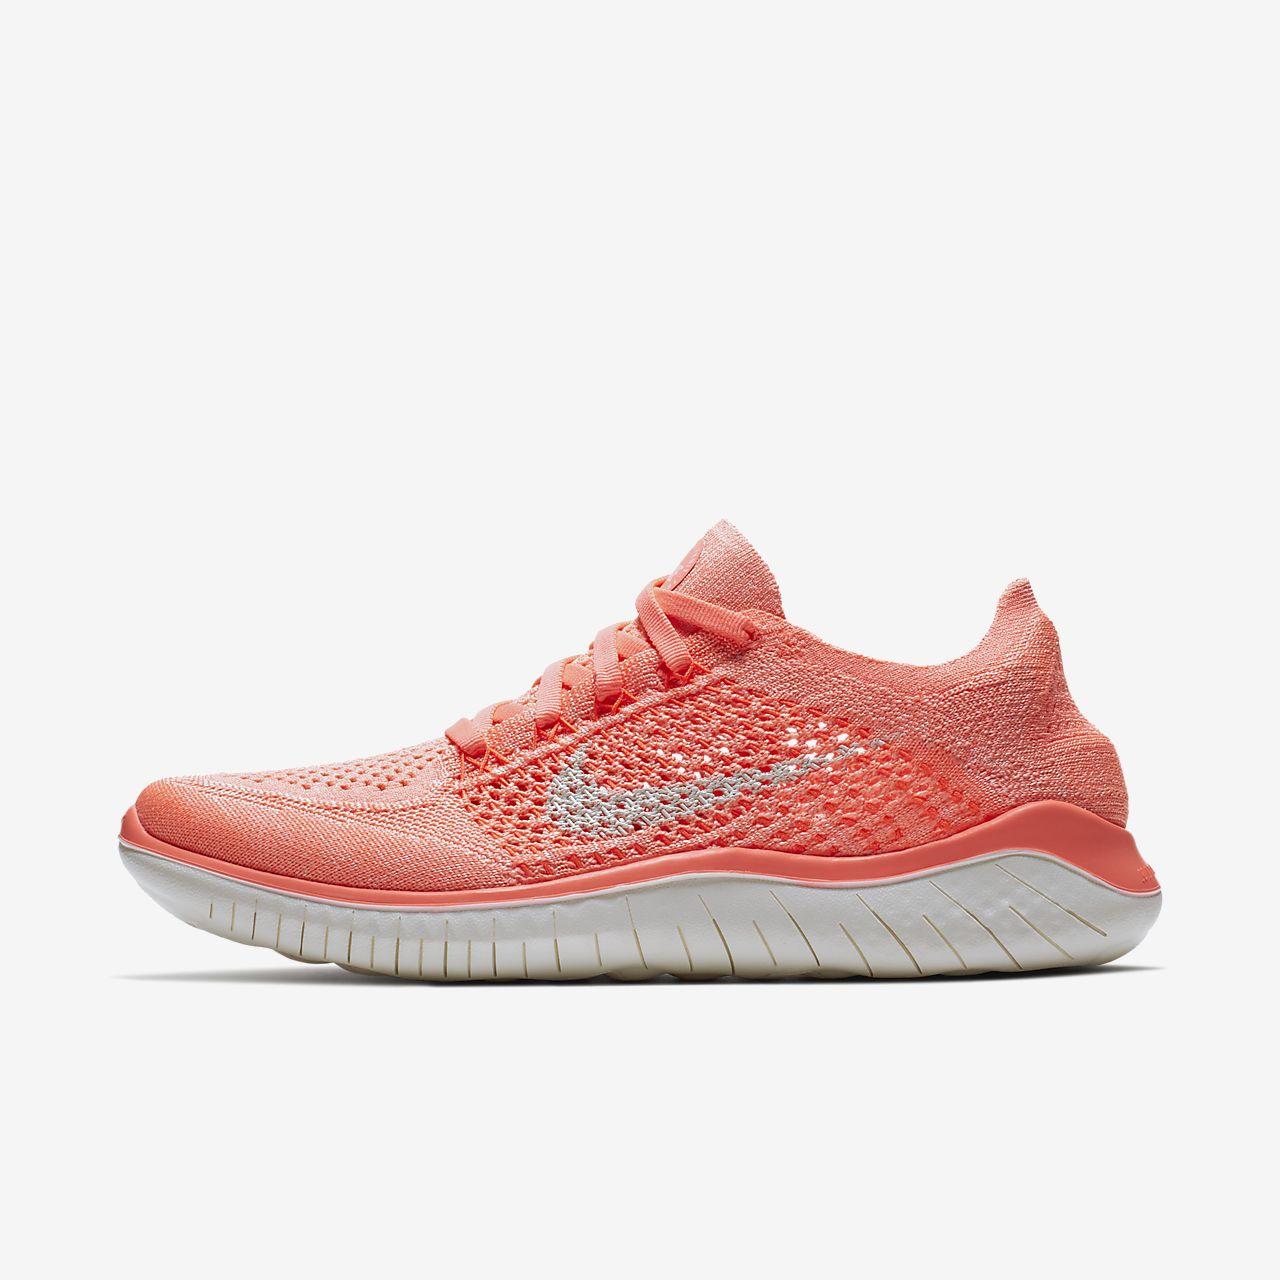 Wmns Nike Libre Rn Flyknit 2018 - Chaussures Pour Femmes / Orange Nike ZBiTYuaITi